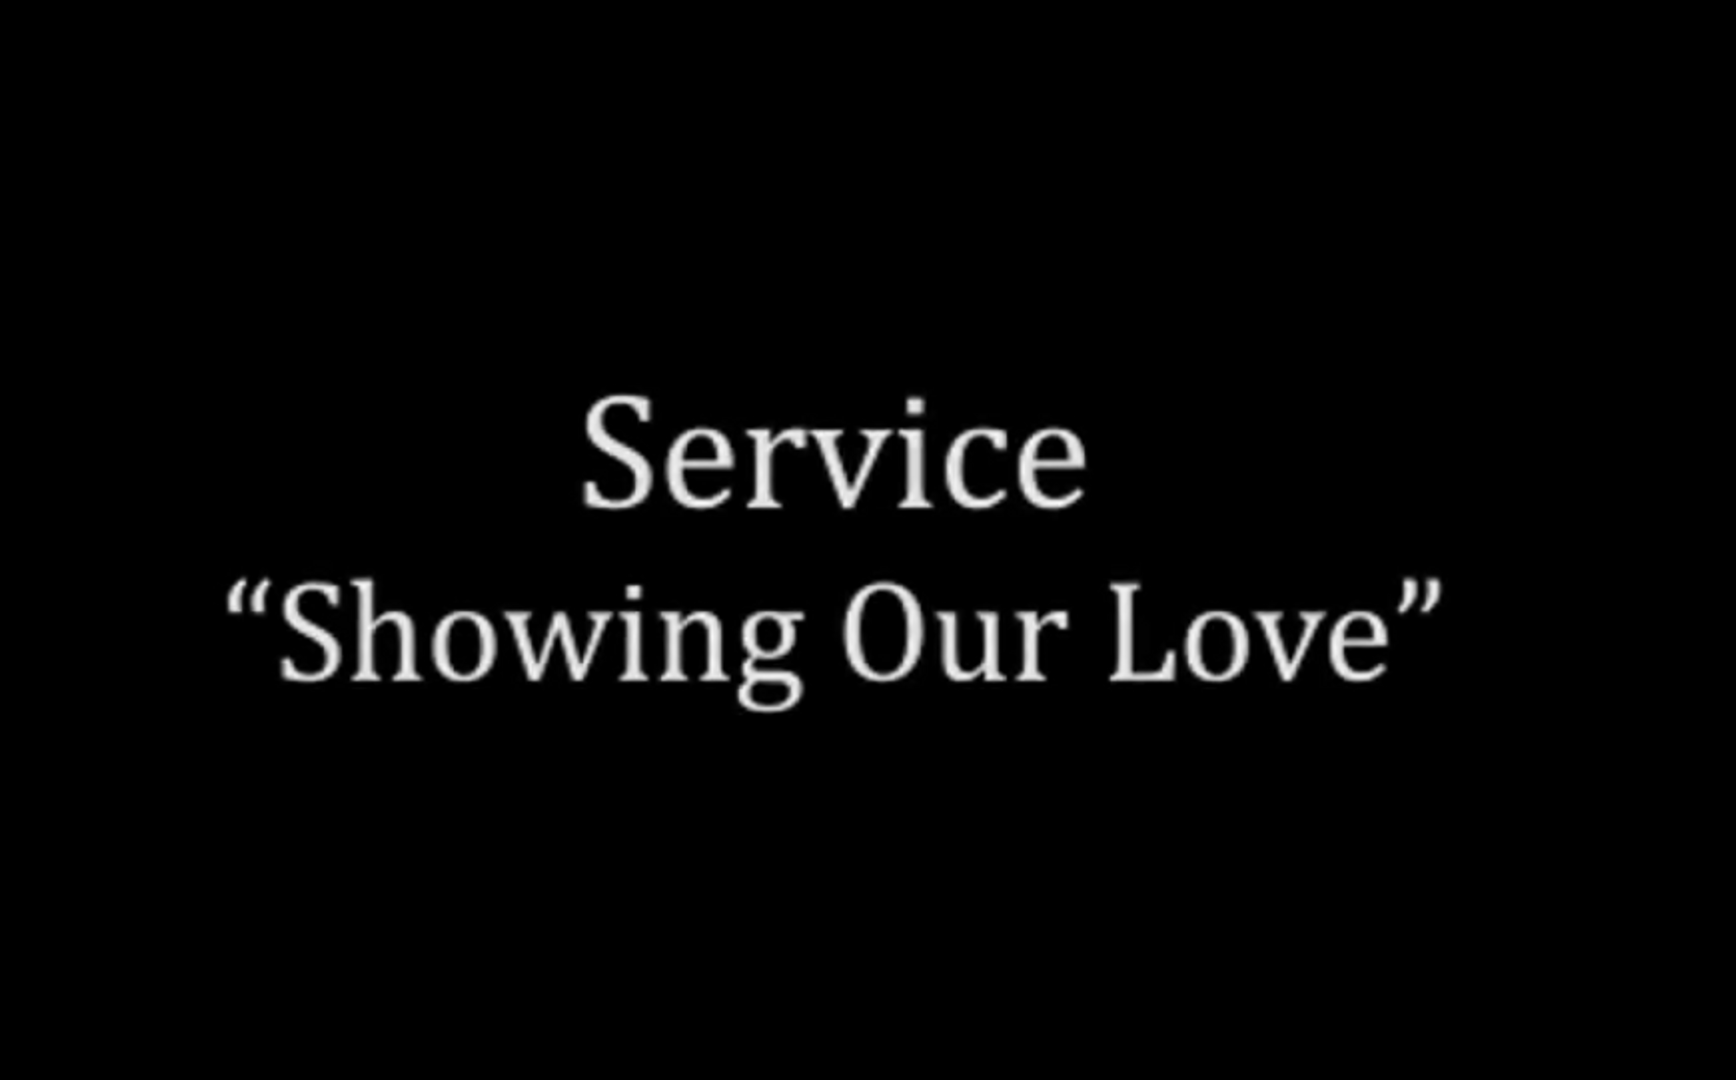 Video Service-.mp4